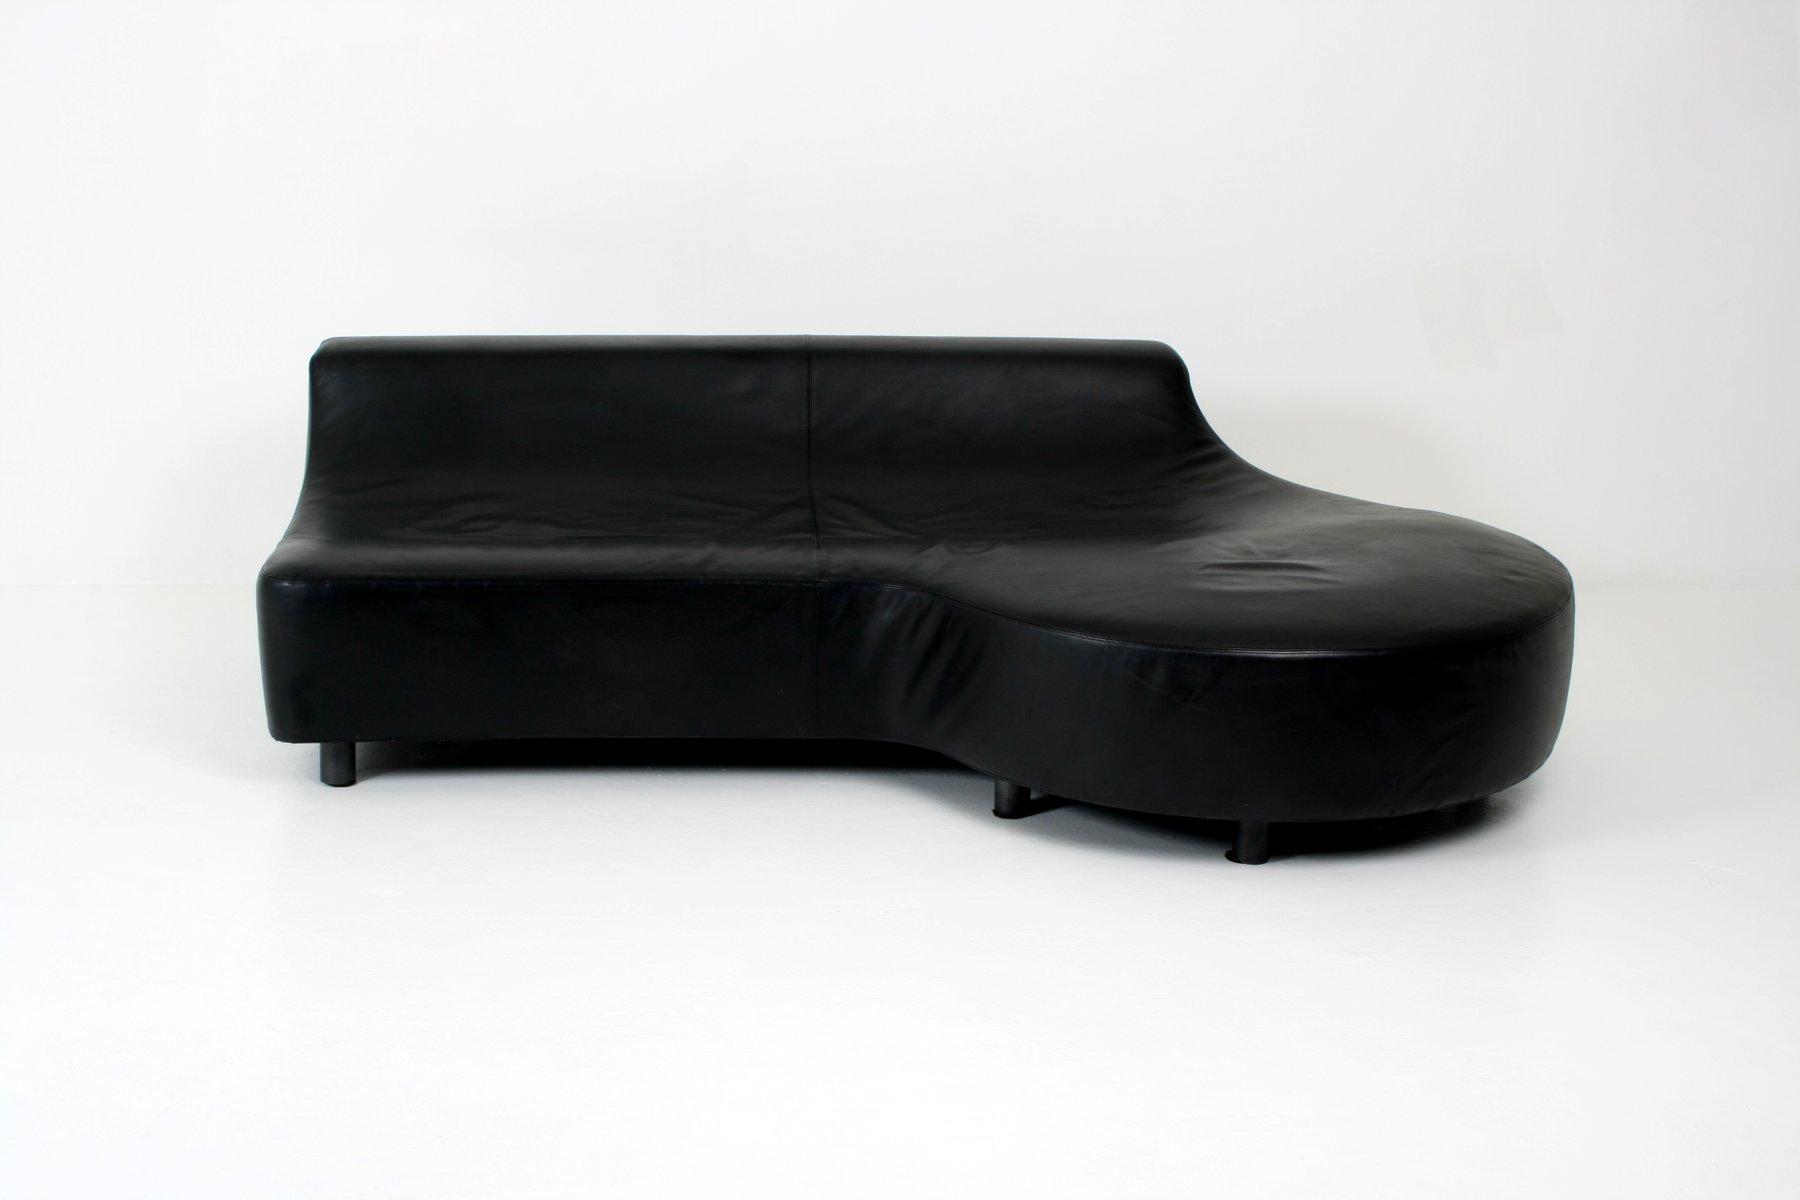 Black Leather Sofa by Rodolfo Dordini for Minotti for sale at Pamono